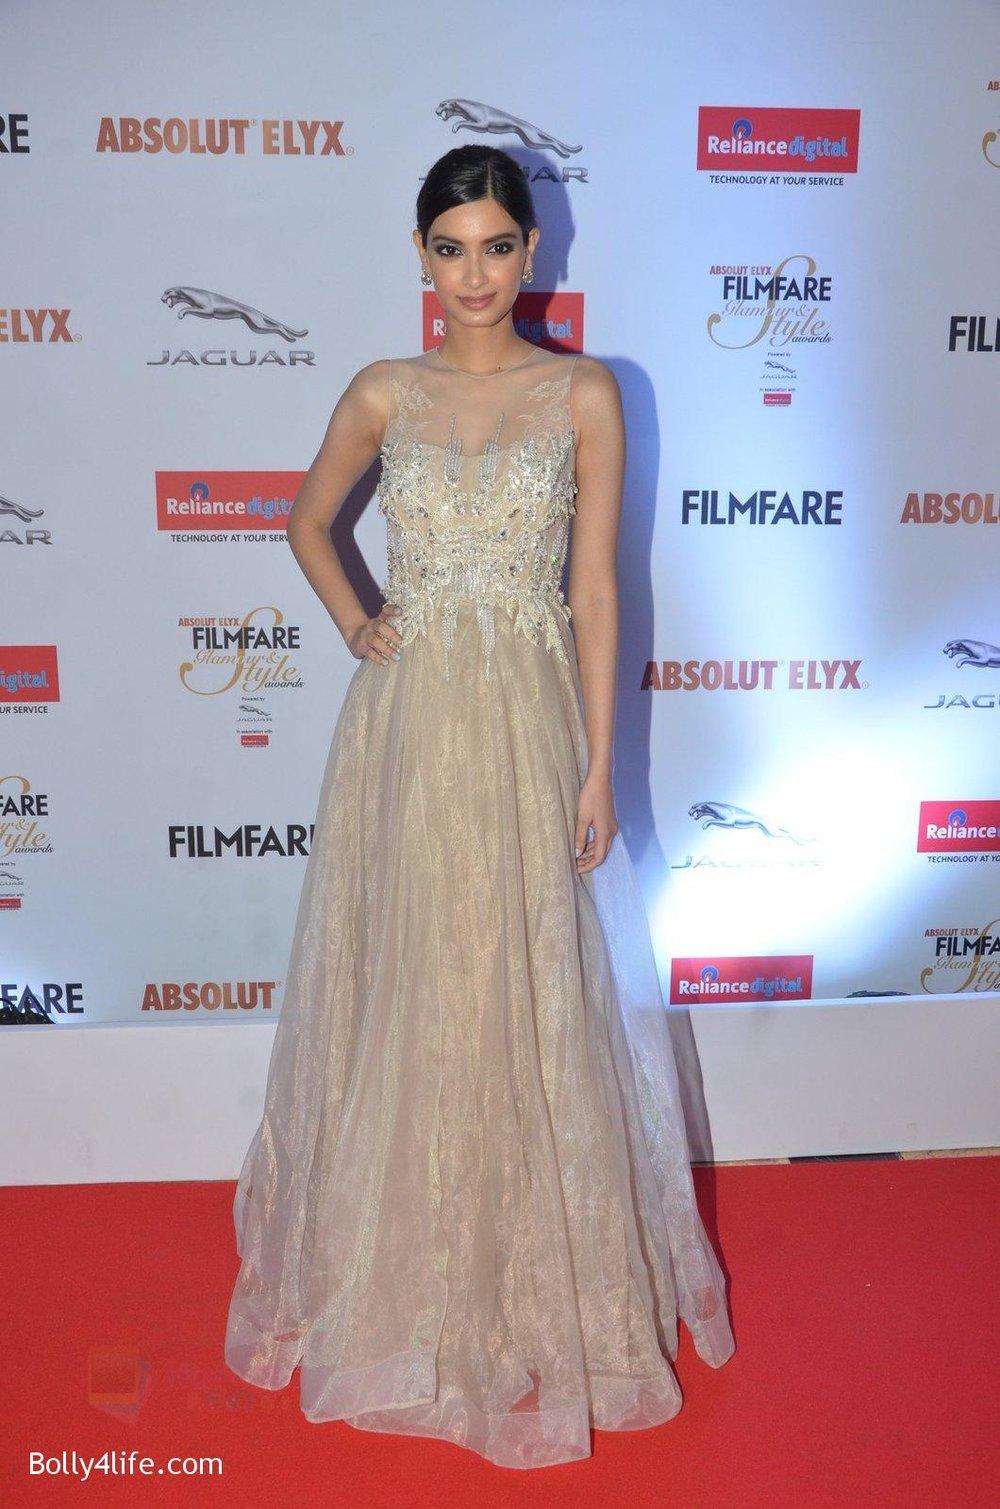 Diana-Penty-at-Filmfare-Glamour-Style-Awards-2016-in-Mumbai-on-15th-Oct-2016-1803.jpg